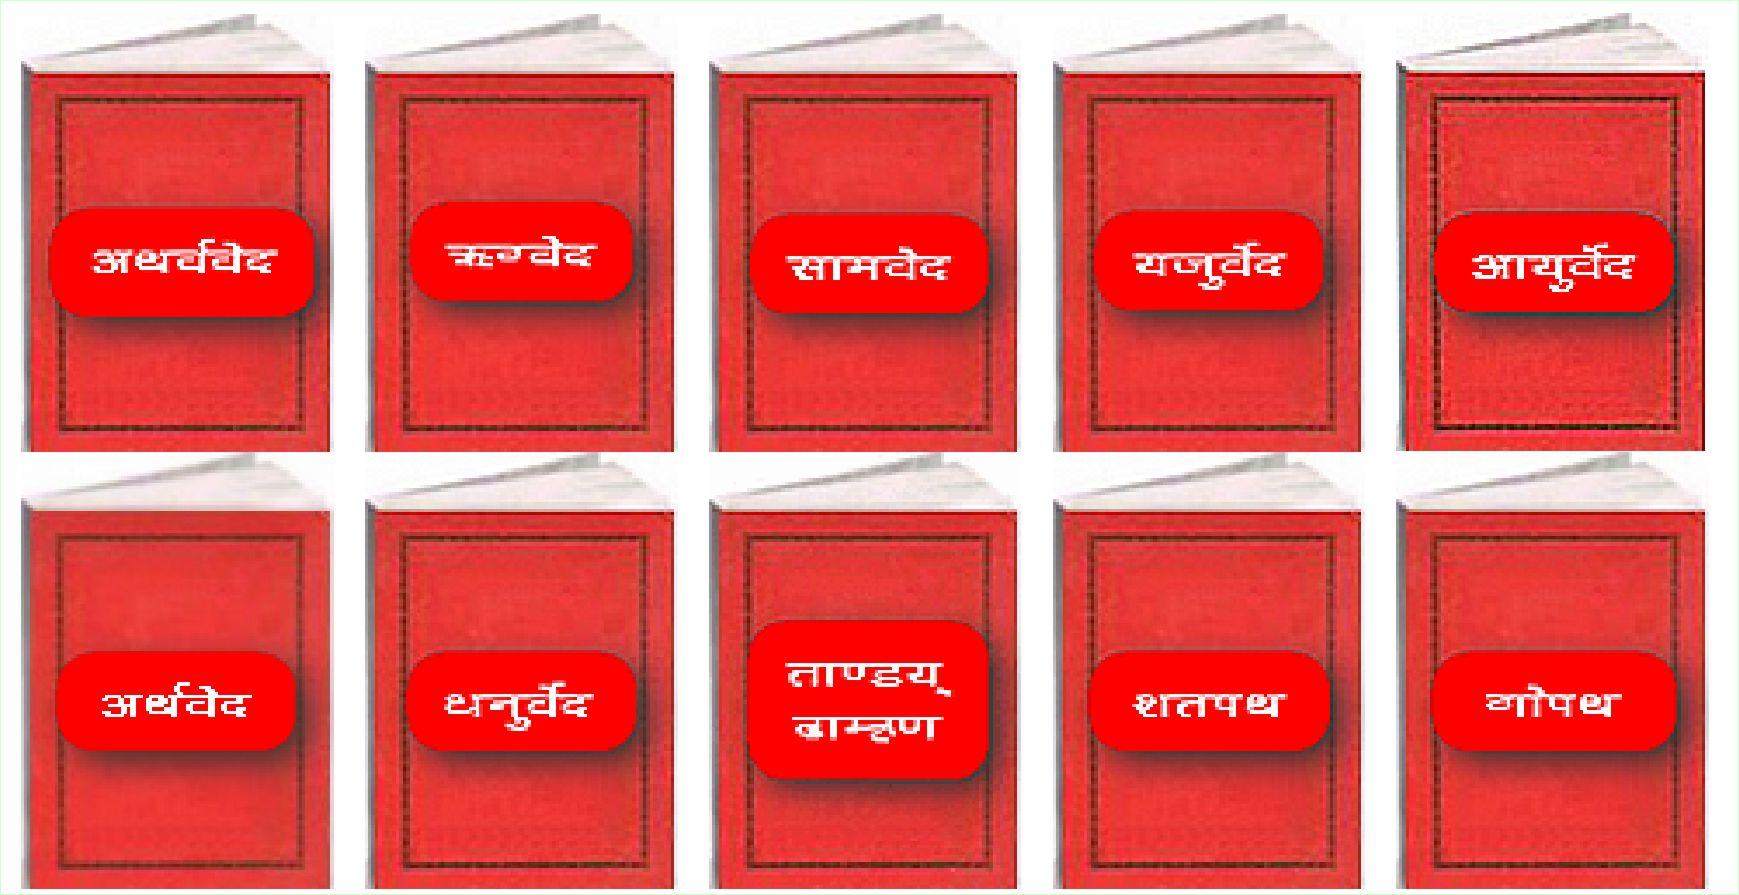 Chaturpata Atharvan Ved : Religious Spiritual Books Library